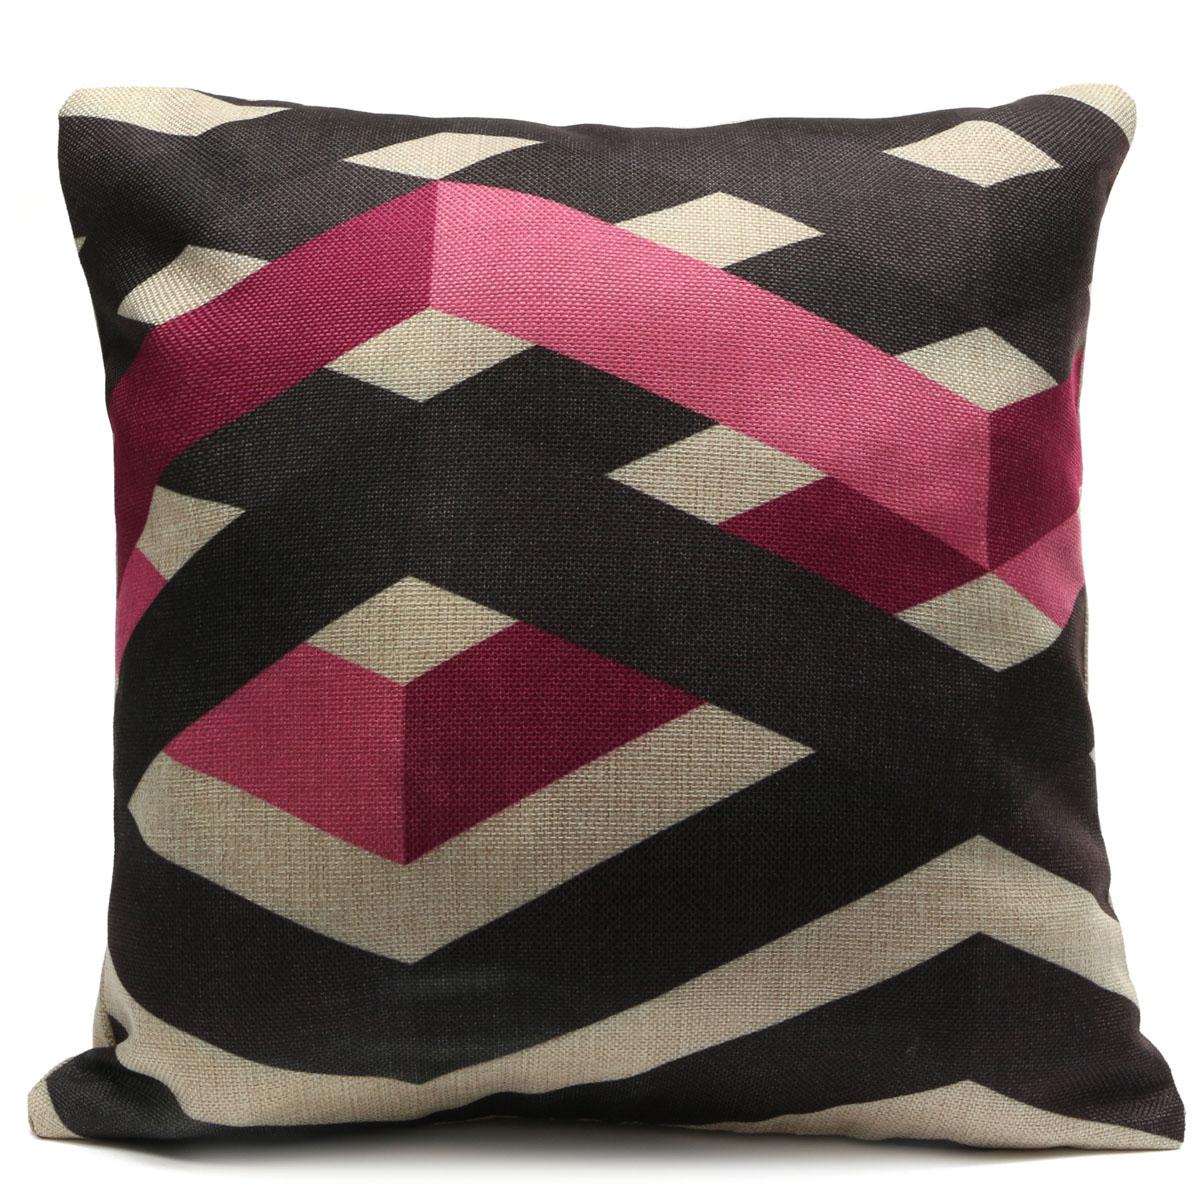 Geometric-Stripe-Wave-Zig-Zag-Pillow-Case-Cushion-Cover-Linen-Cotton-Home-Decor thumbnail 2